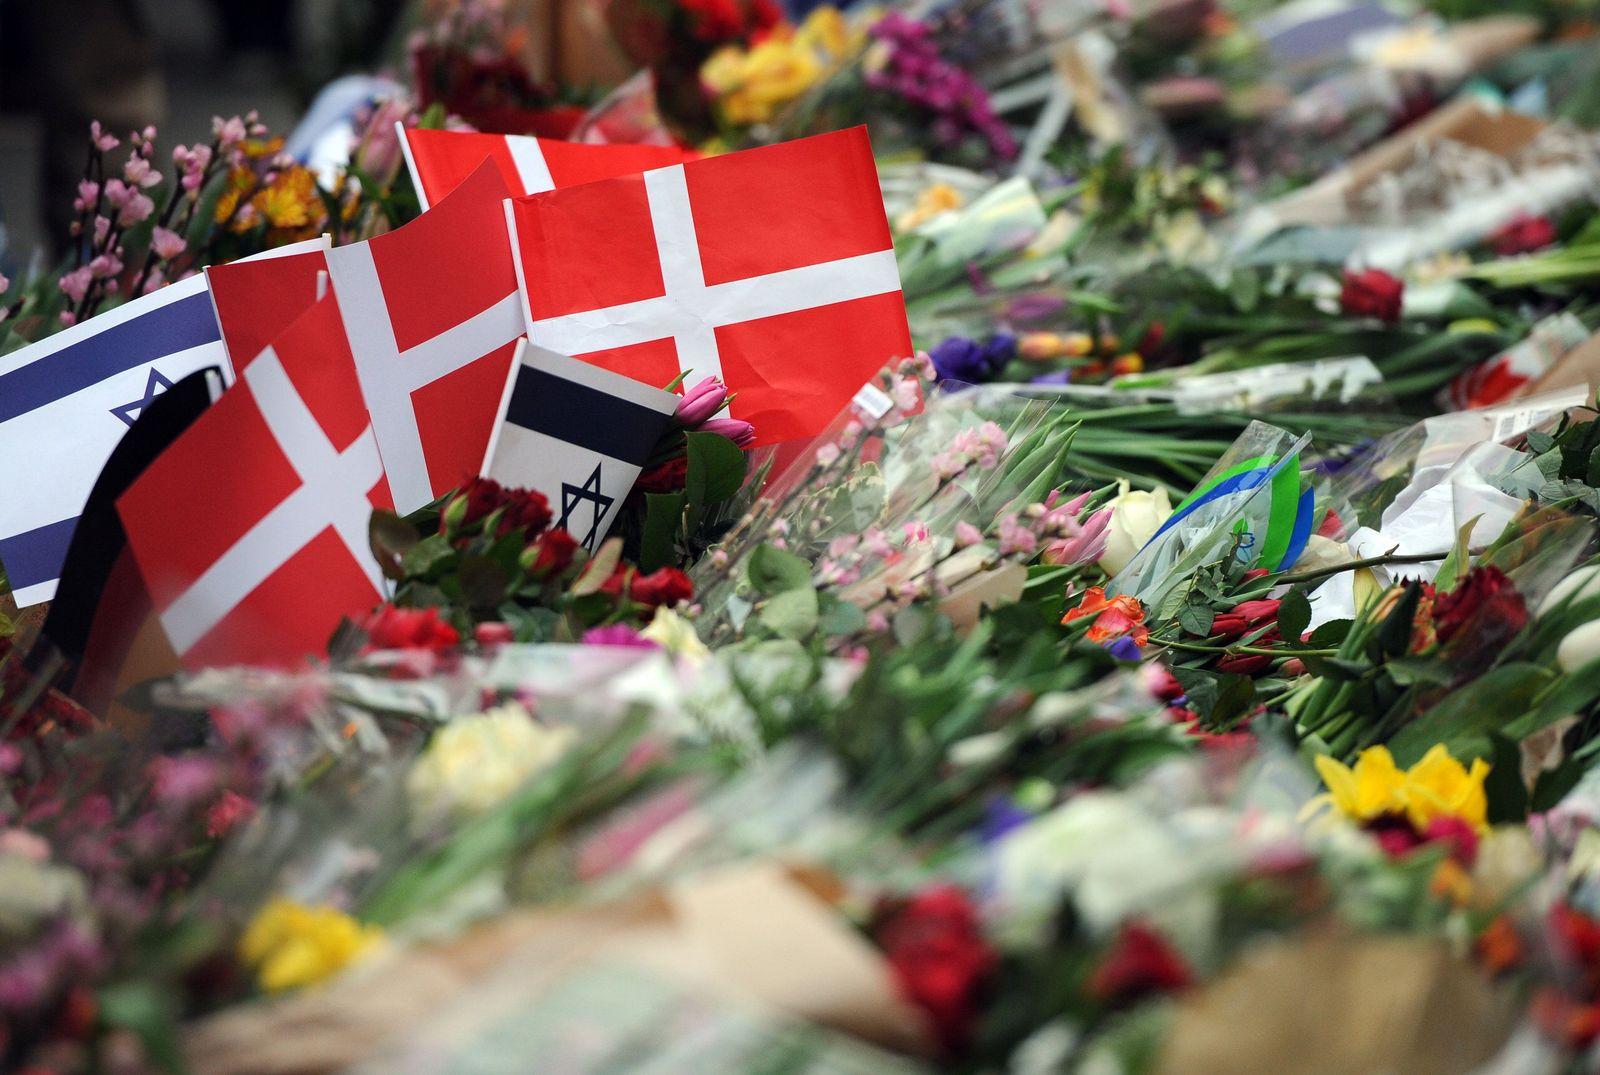 After terror attack in Copenhagen - Synagogue